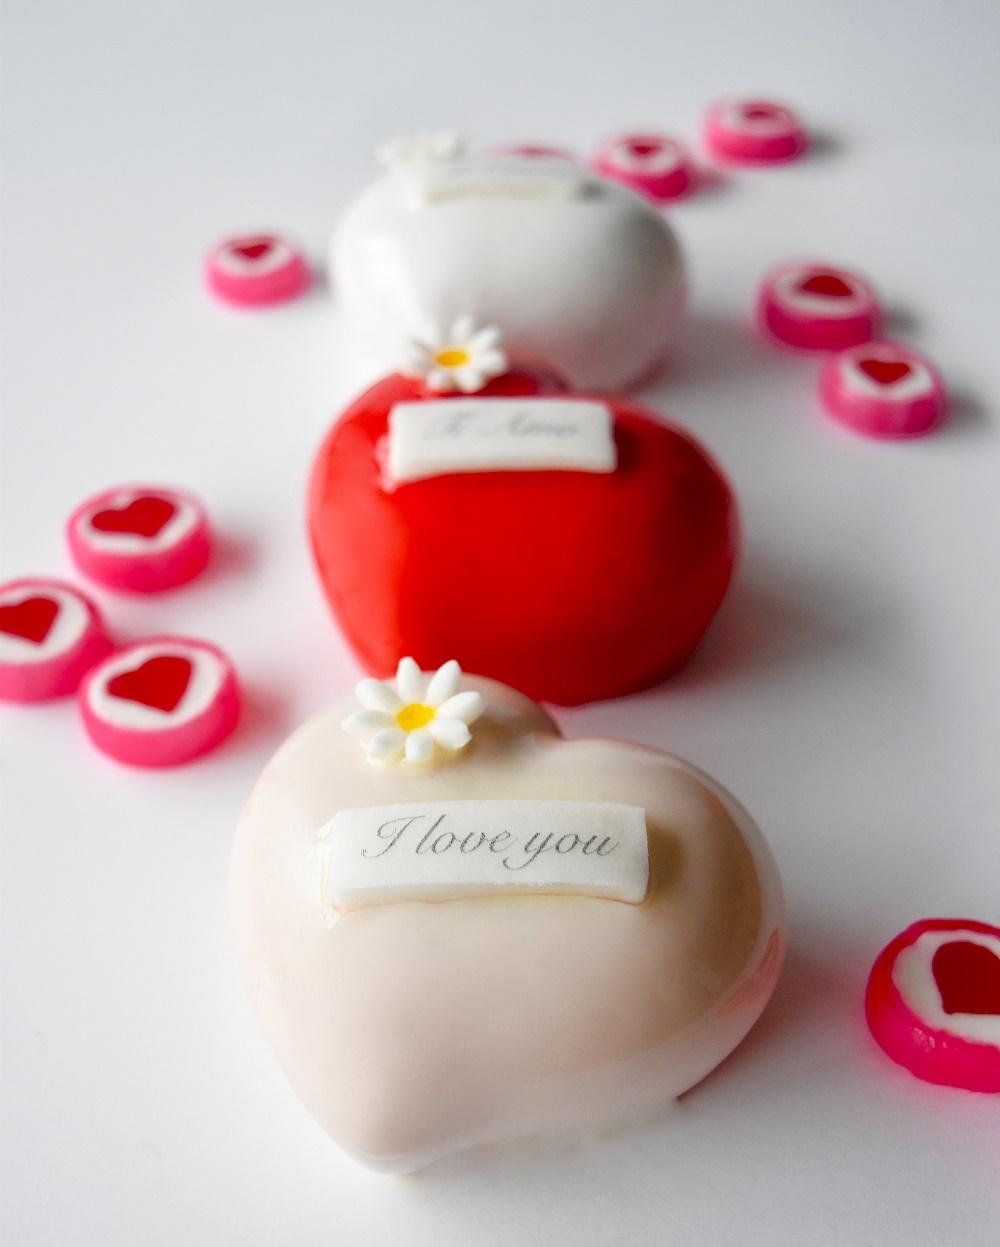 due dolci proposte per san valentino nicolò moschella